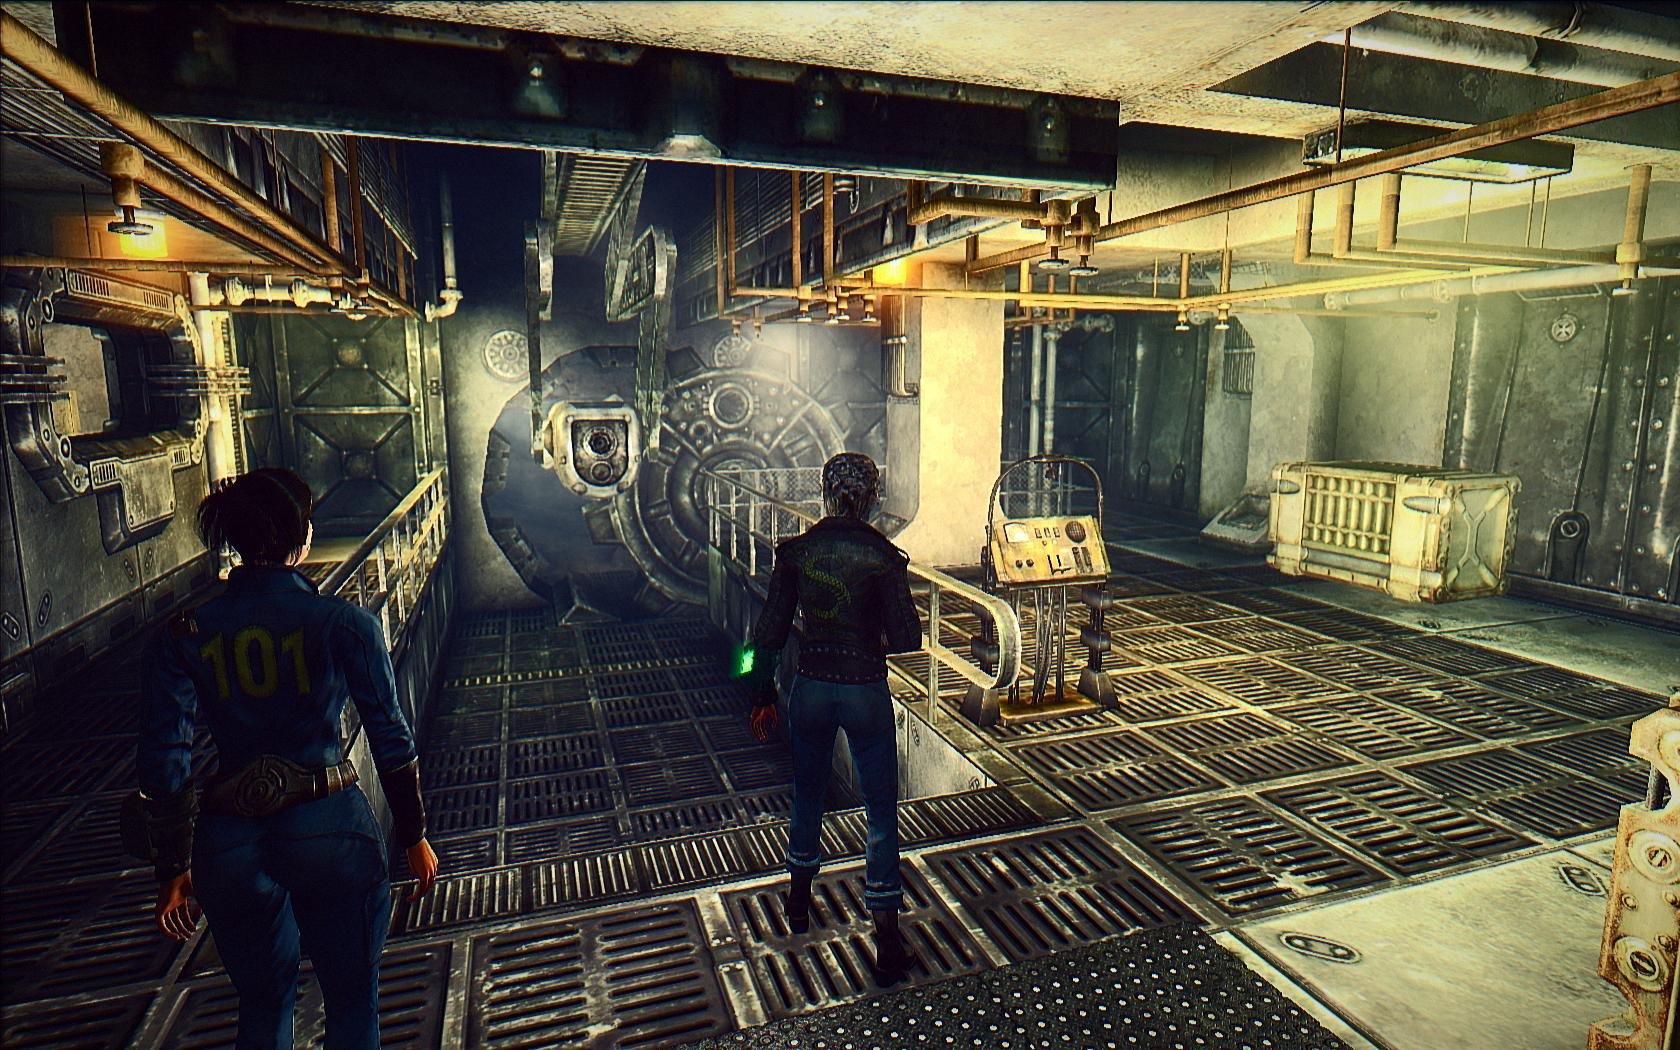 Fallout3 2018-10-01 22-13-27-50.jpg